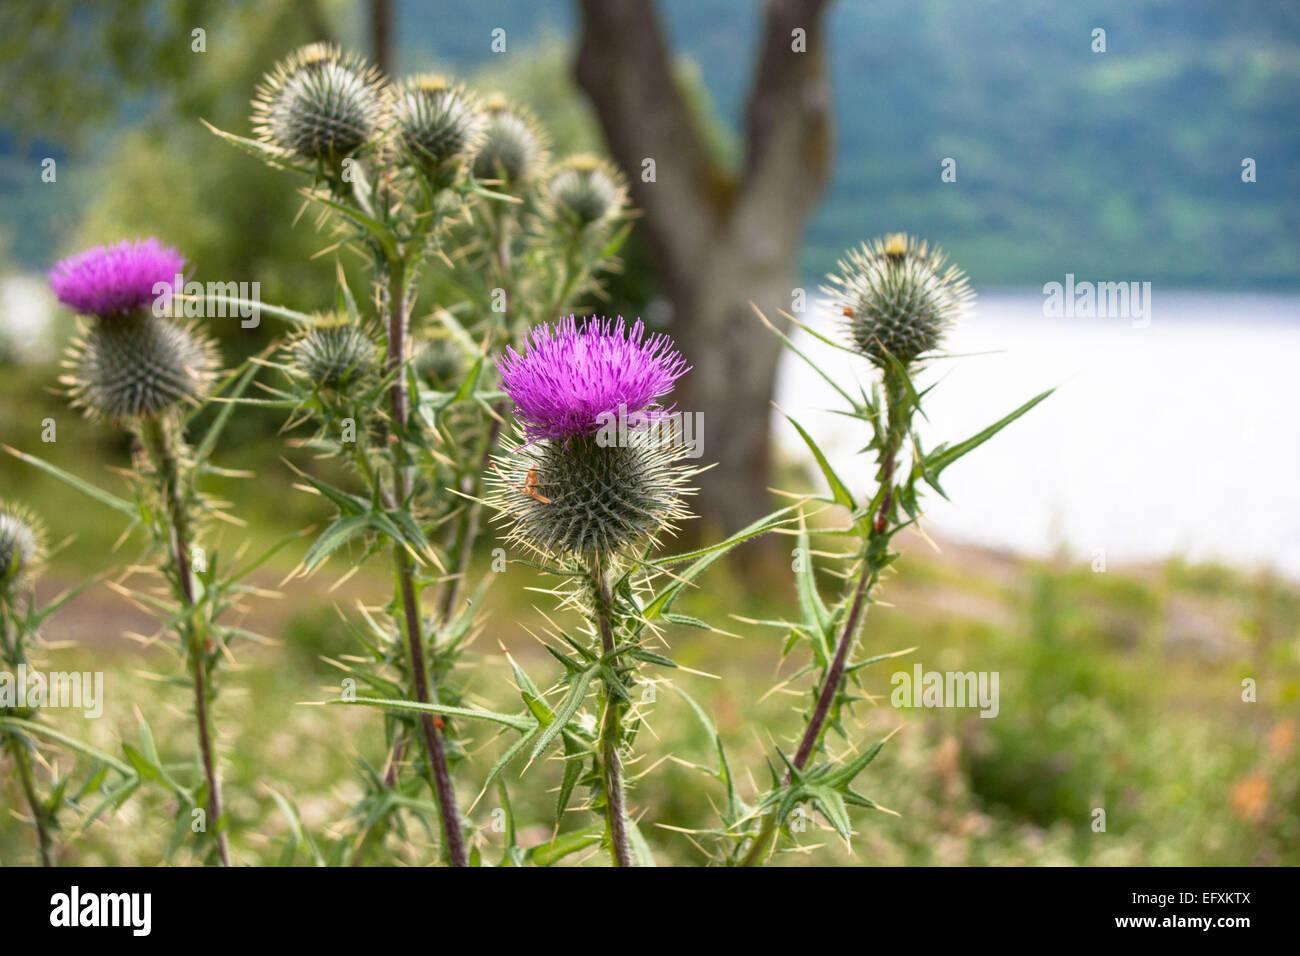 Scottish Thistles - Stock Image